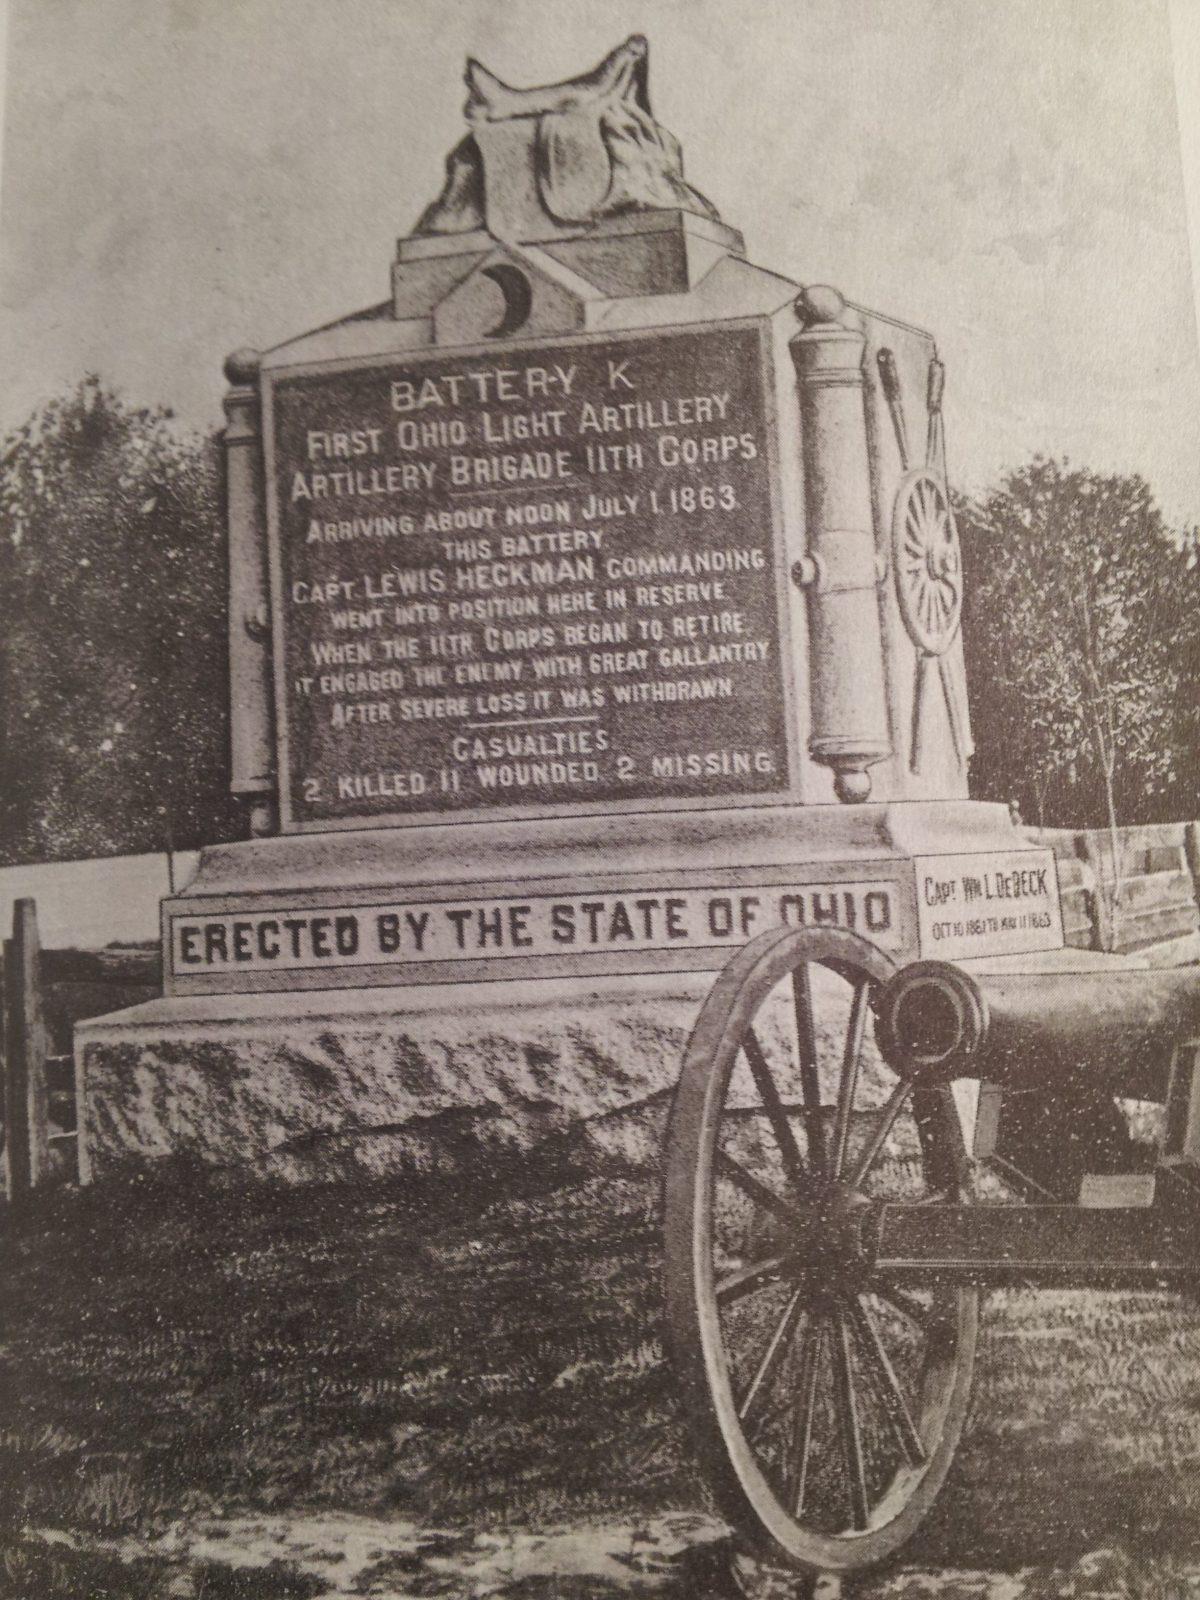 Heckman's Hidden Heroes:  Battery K, First Ohio Light Artillery, 11th Corps